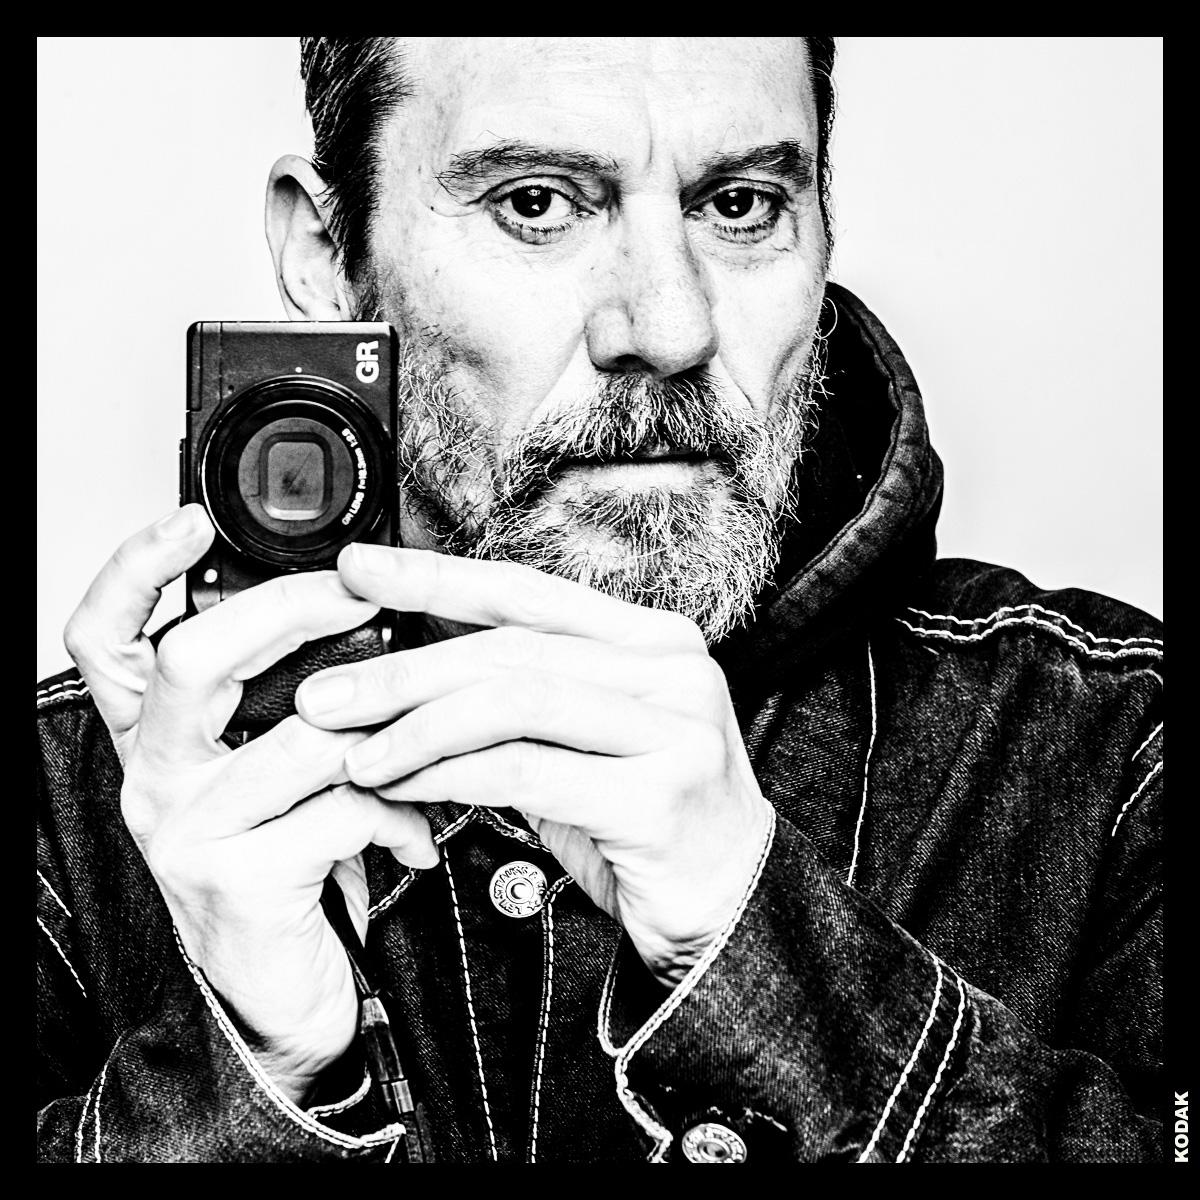 David Gleave - Photographer & Guitarist